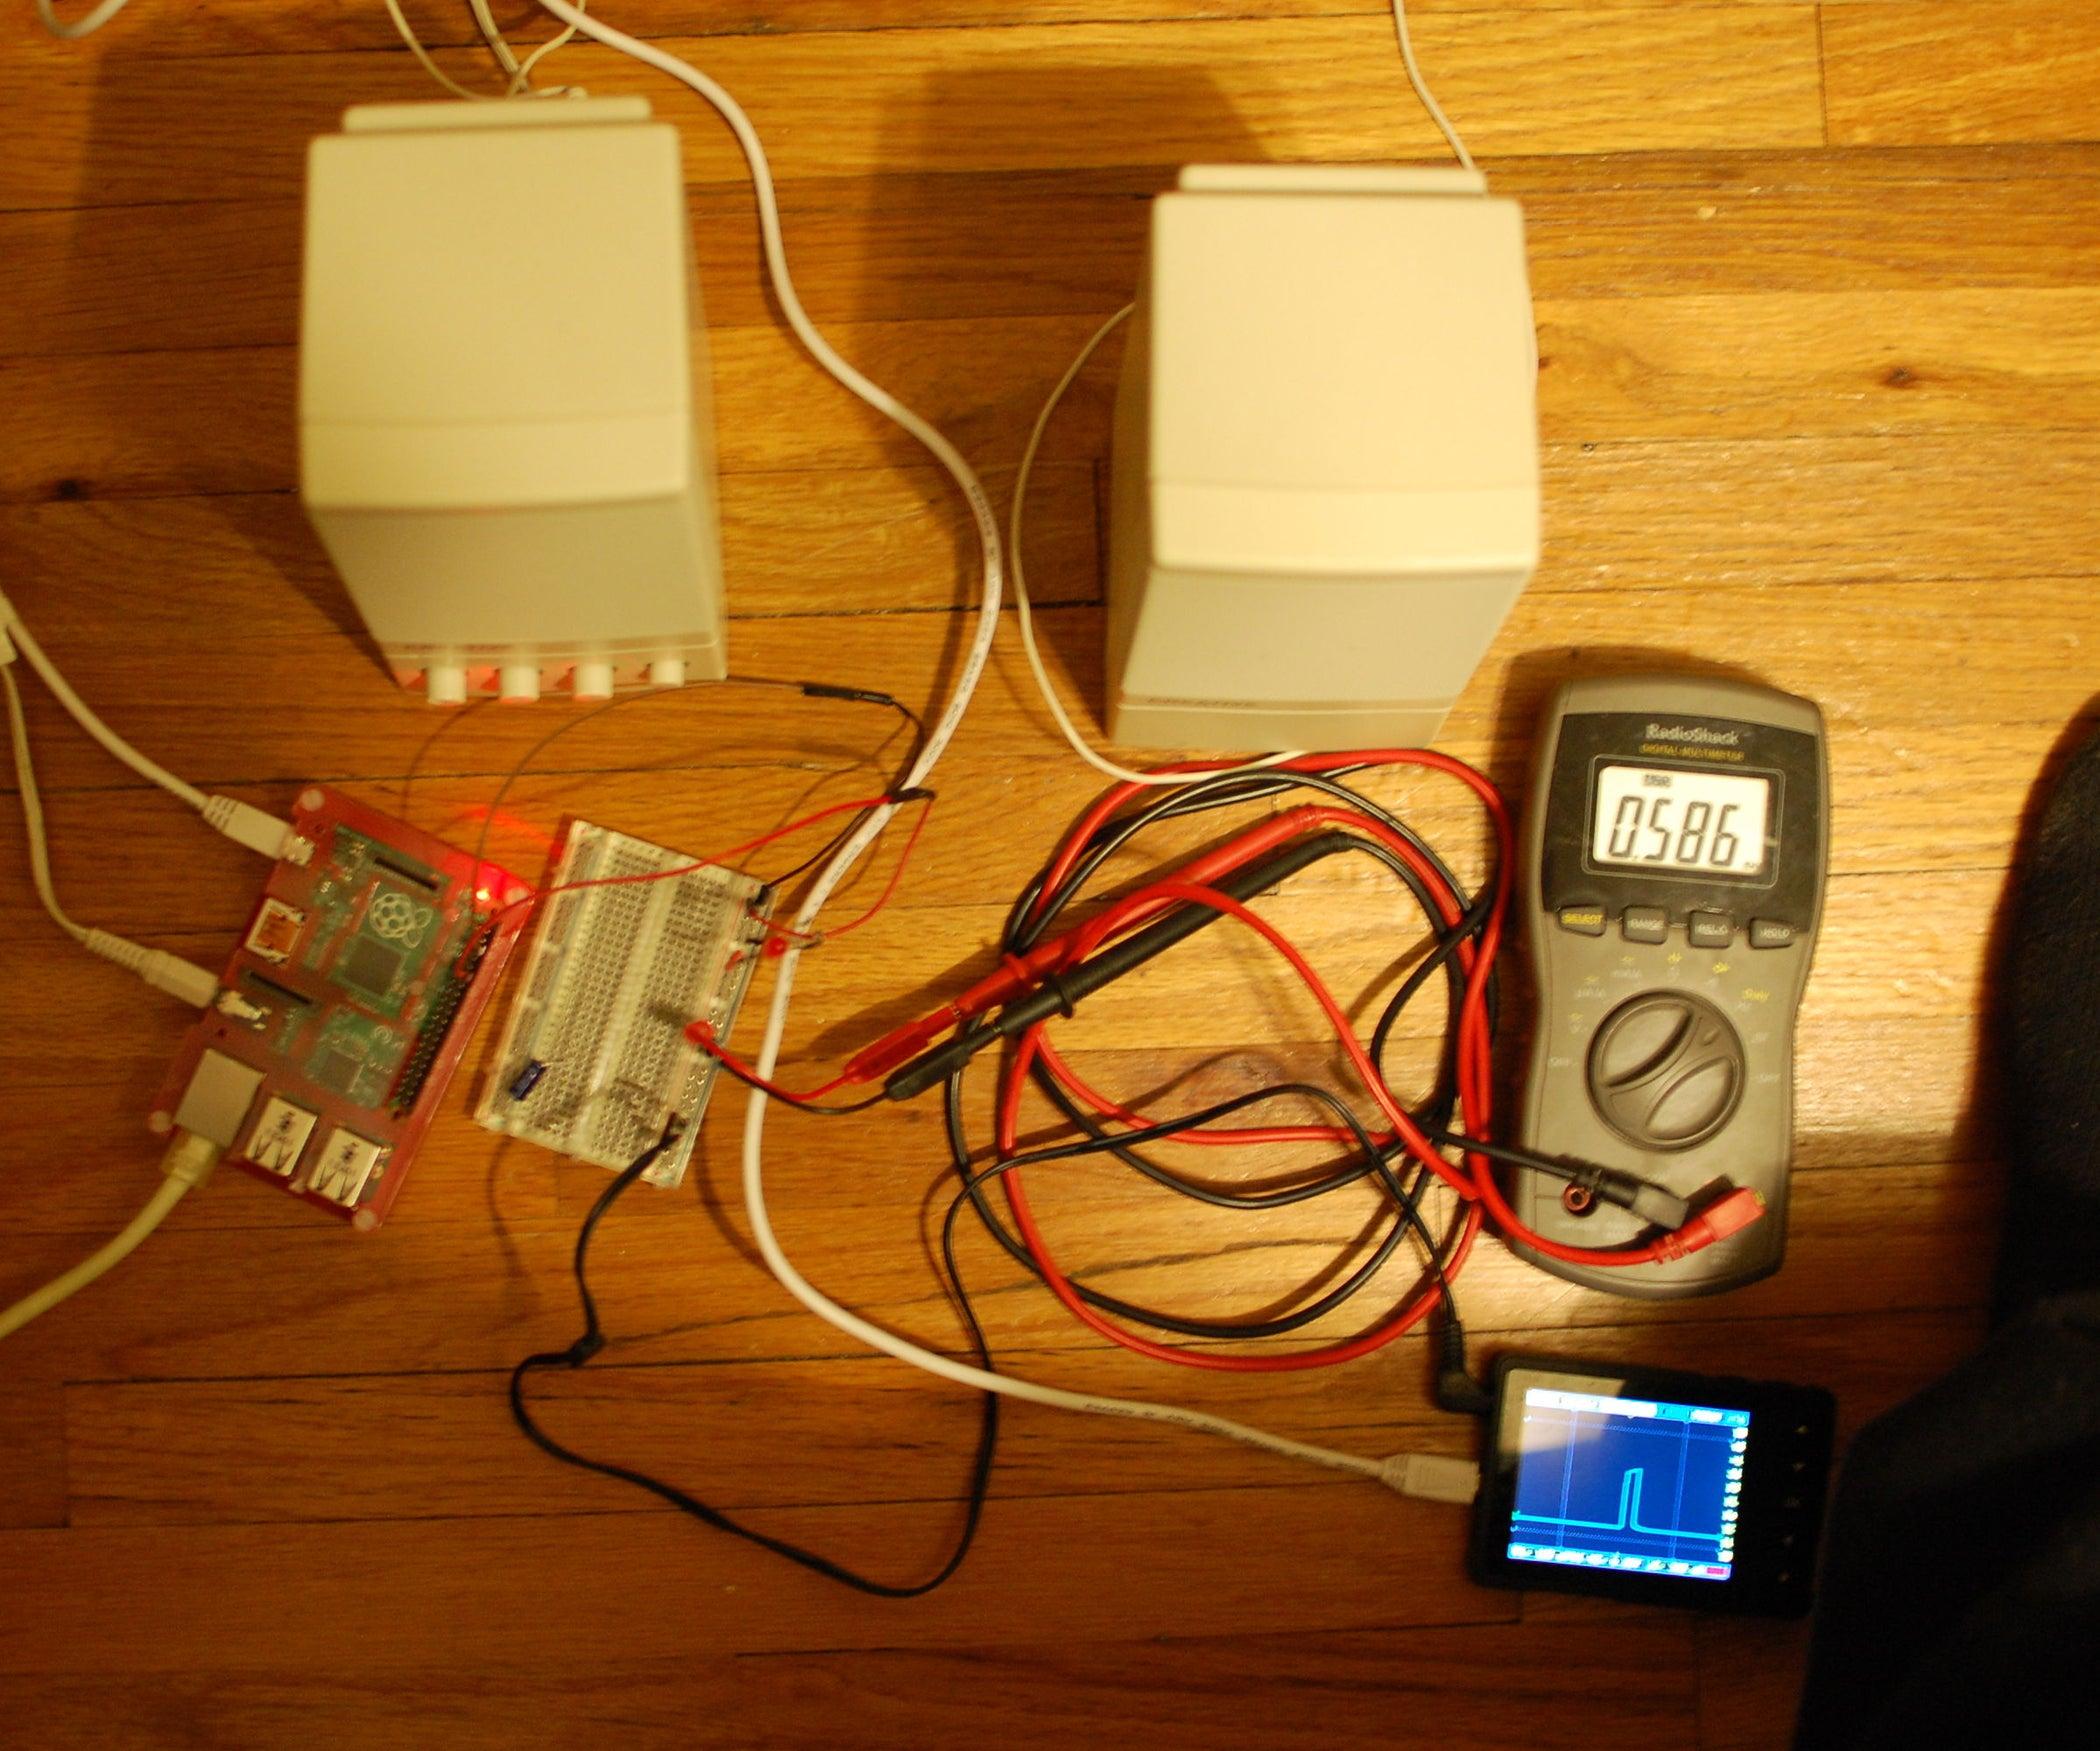 Raspberrypi Pulse Width Modulation Demonstration 9 Steps Wiringpi Pwm Set Clock